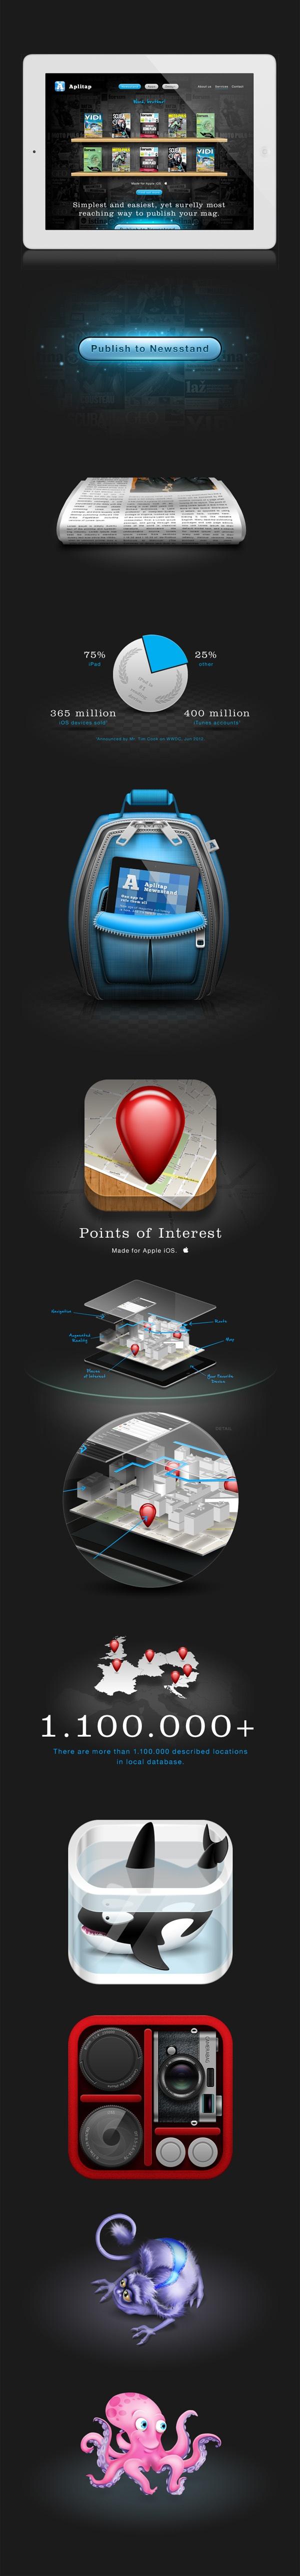 Aplitap website by Hrvoje Bielen, via Behance *** Website design and illustrations for a company Aplitap d.o.o. website.